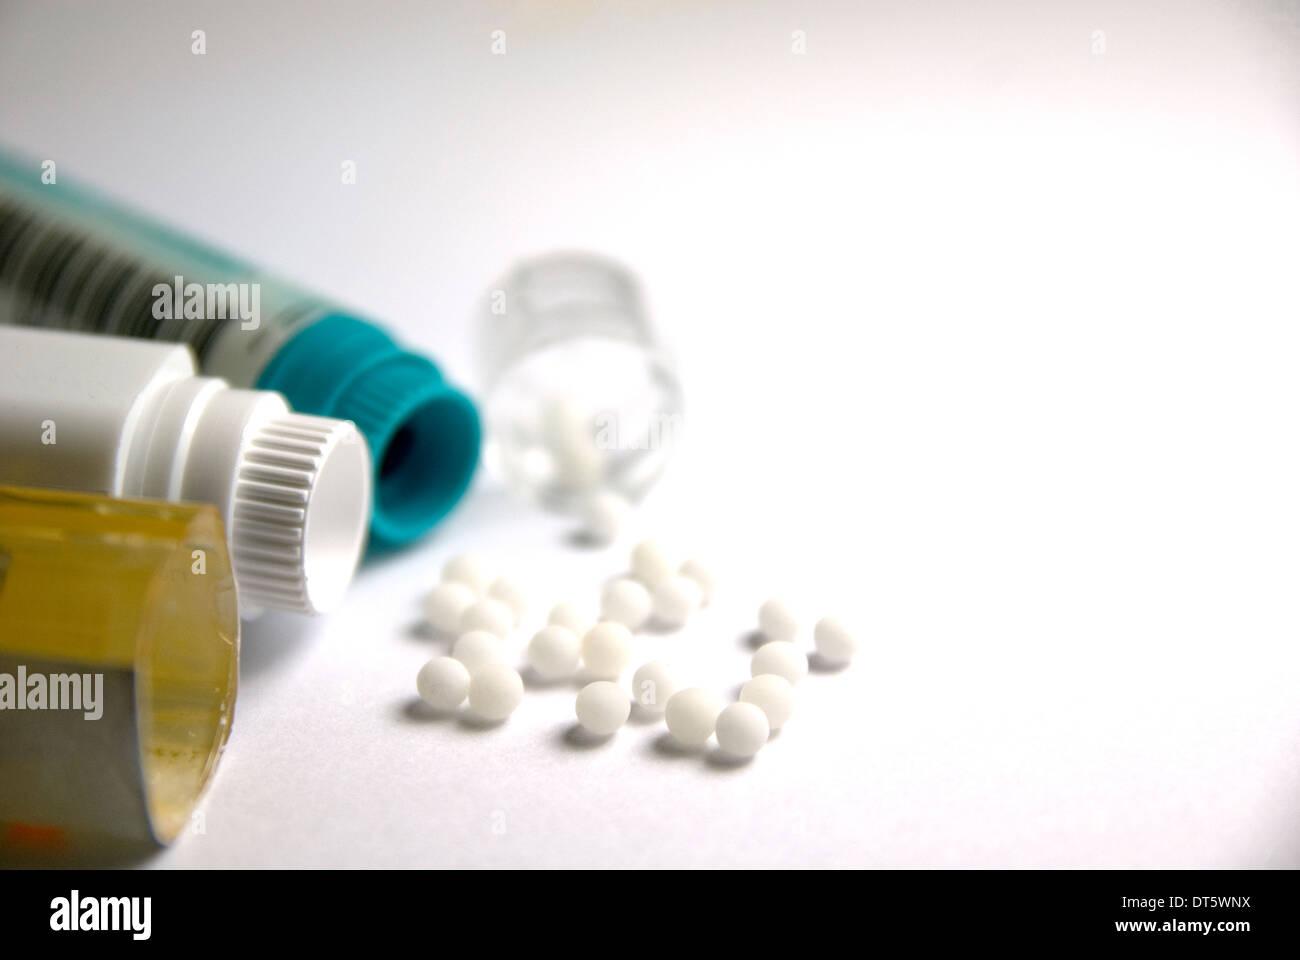 Homeopathy - Stock Image